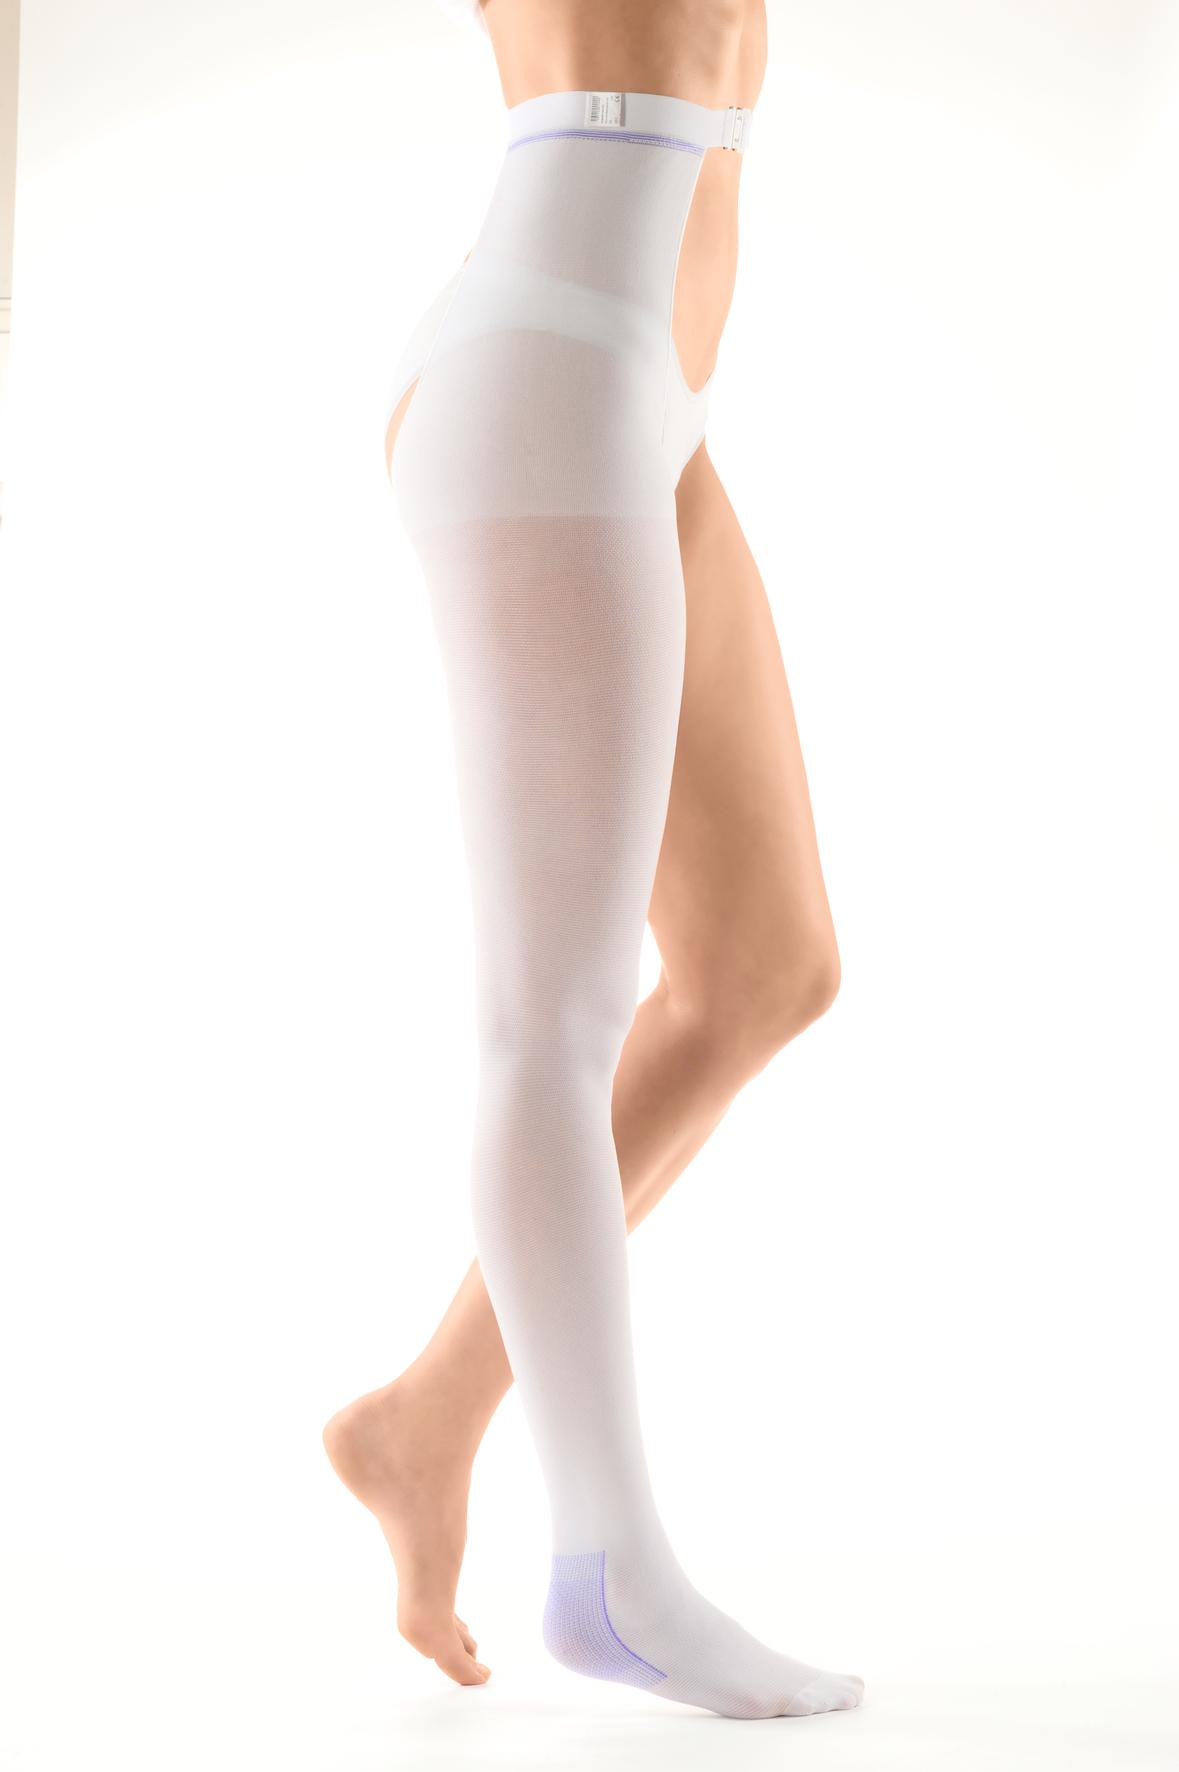 II класса компрессии Чулки антиэмболические с застежкой на талии mediven® struva 23 - белые 11274909.jpg